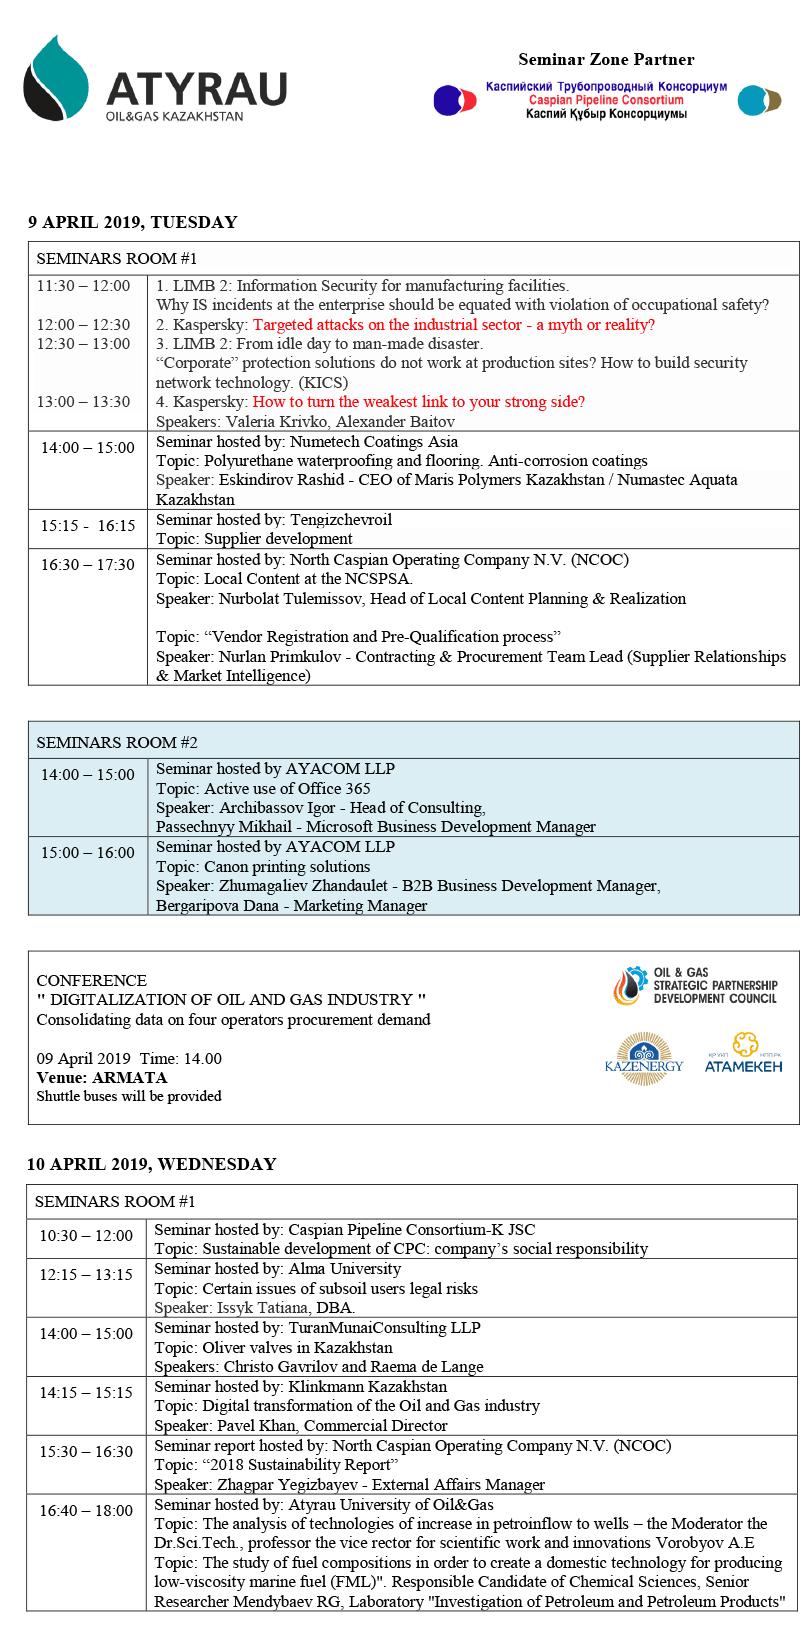 Atyrau19 Programme eng